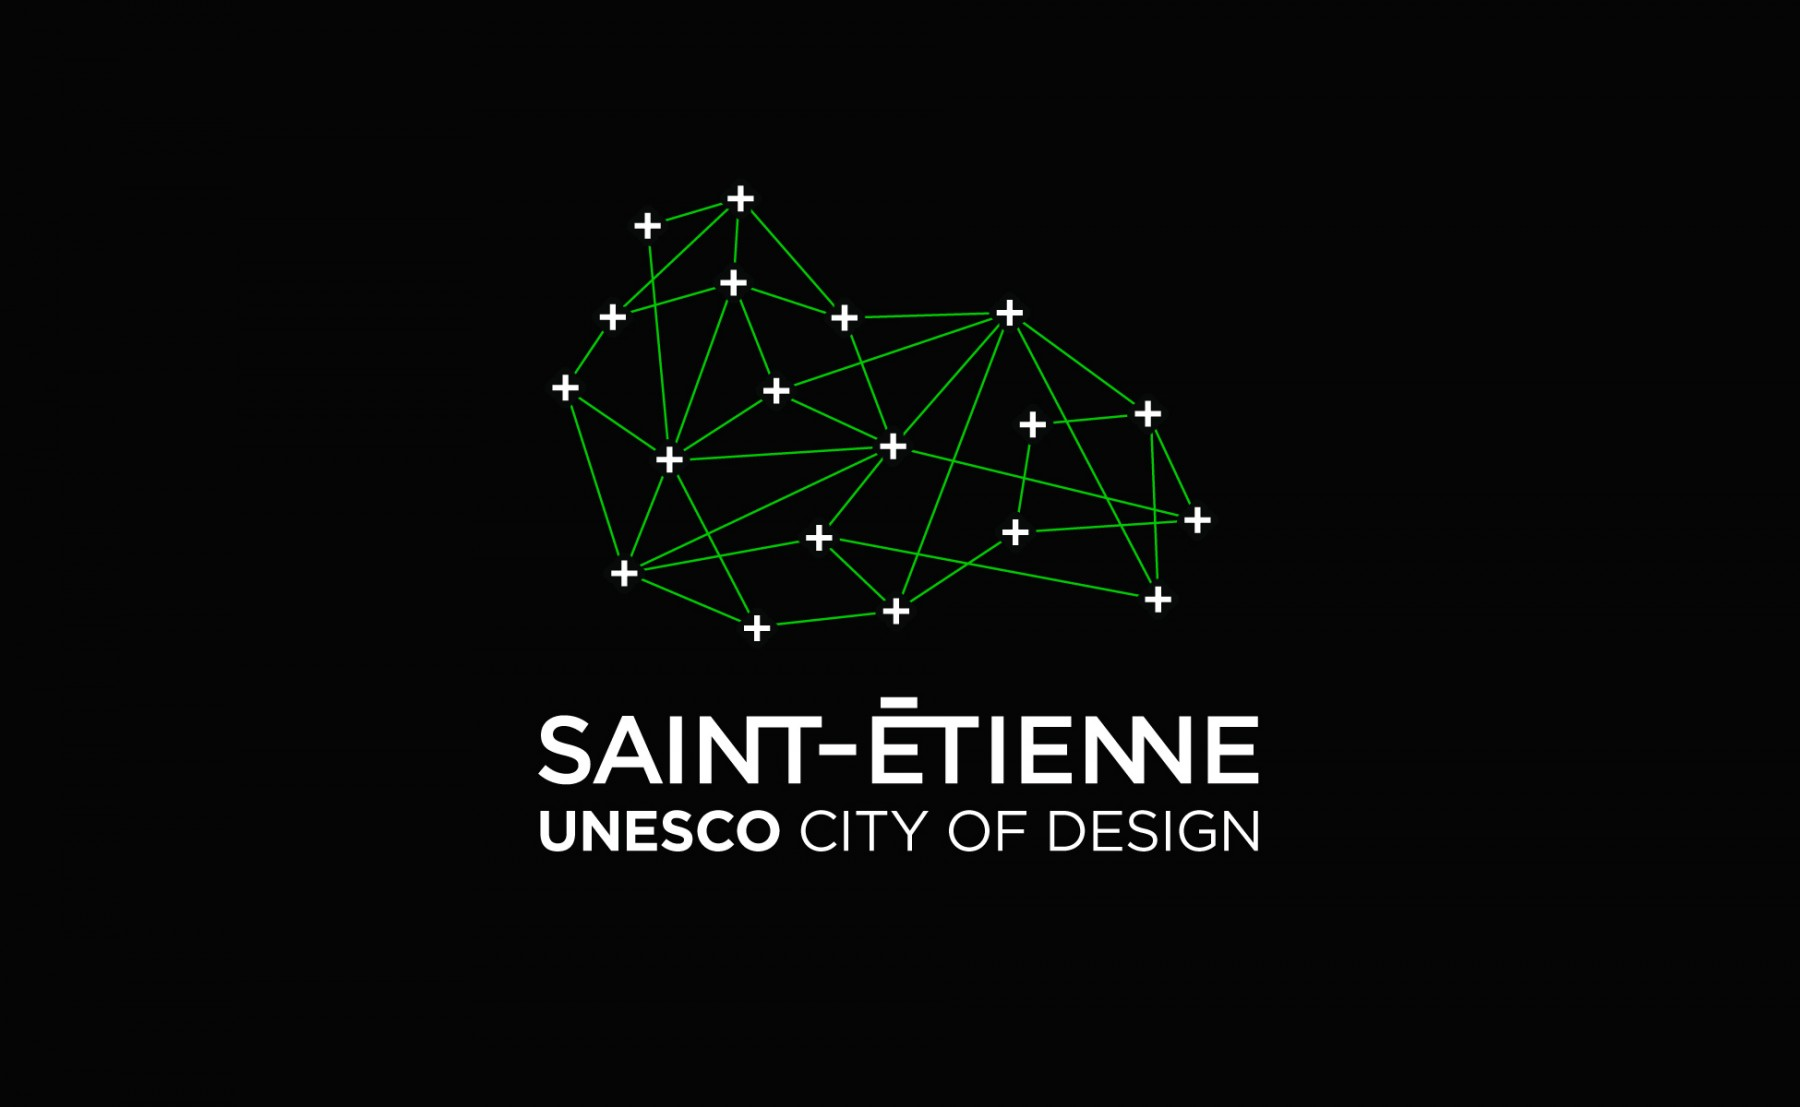 brand design st etienne city of design unesco. Black Bedroom Furniture Sets. Home Design Ideas